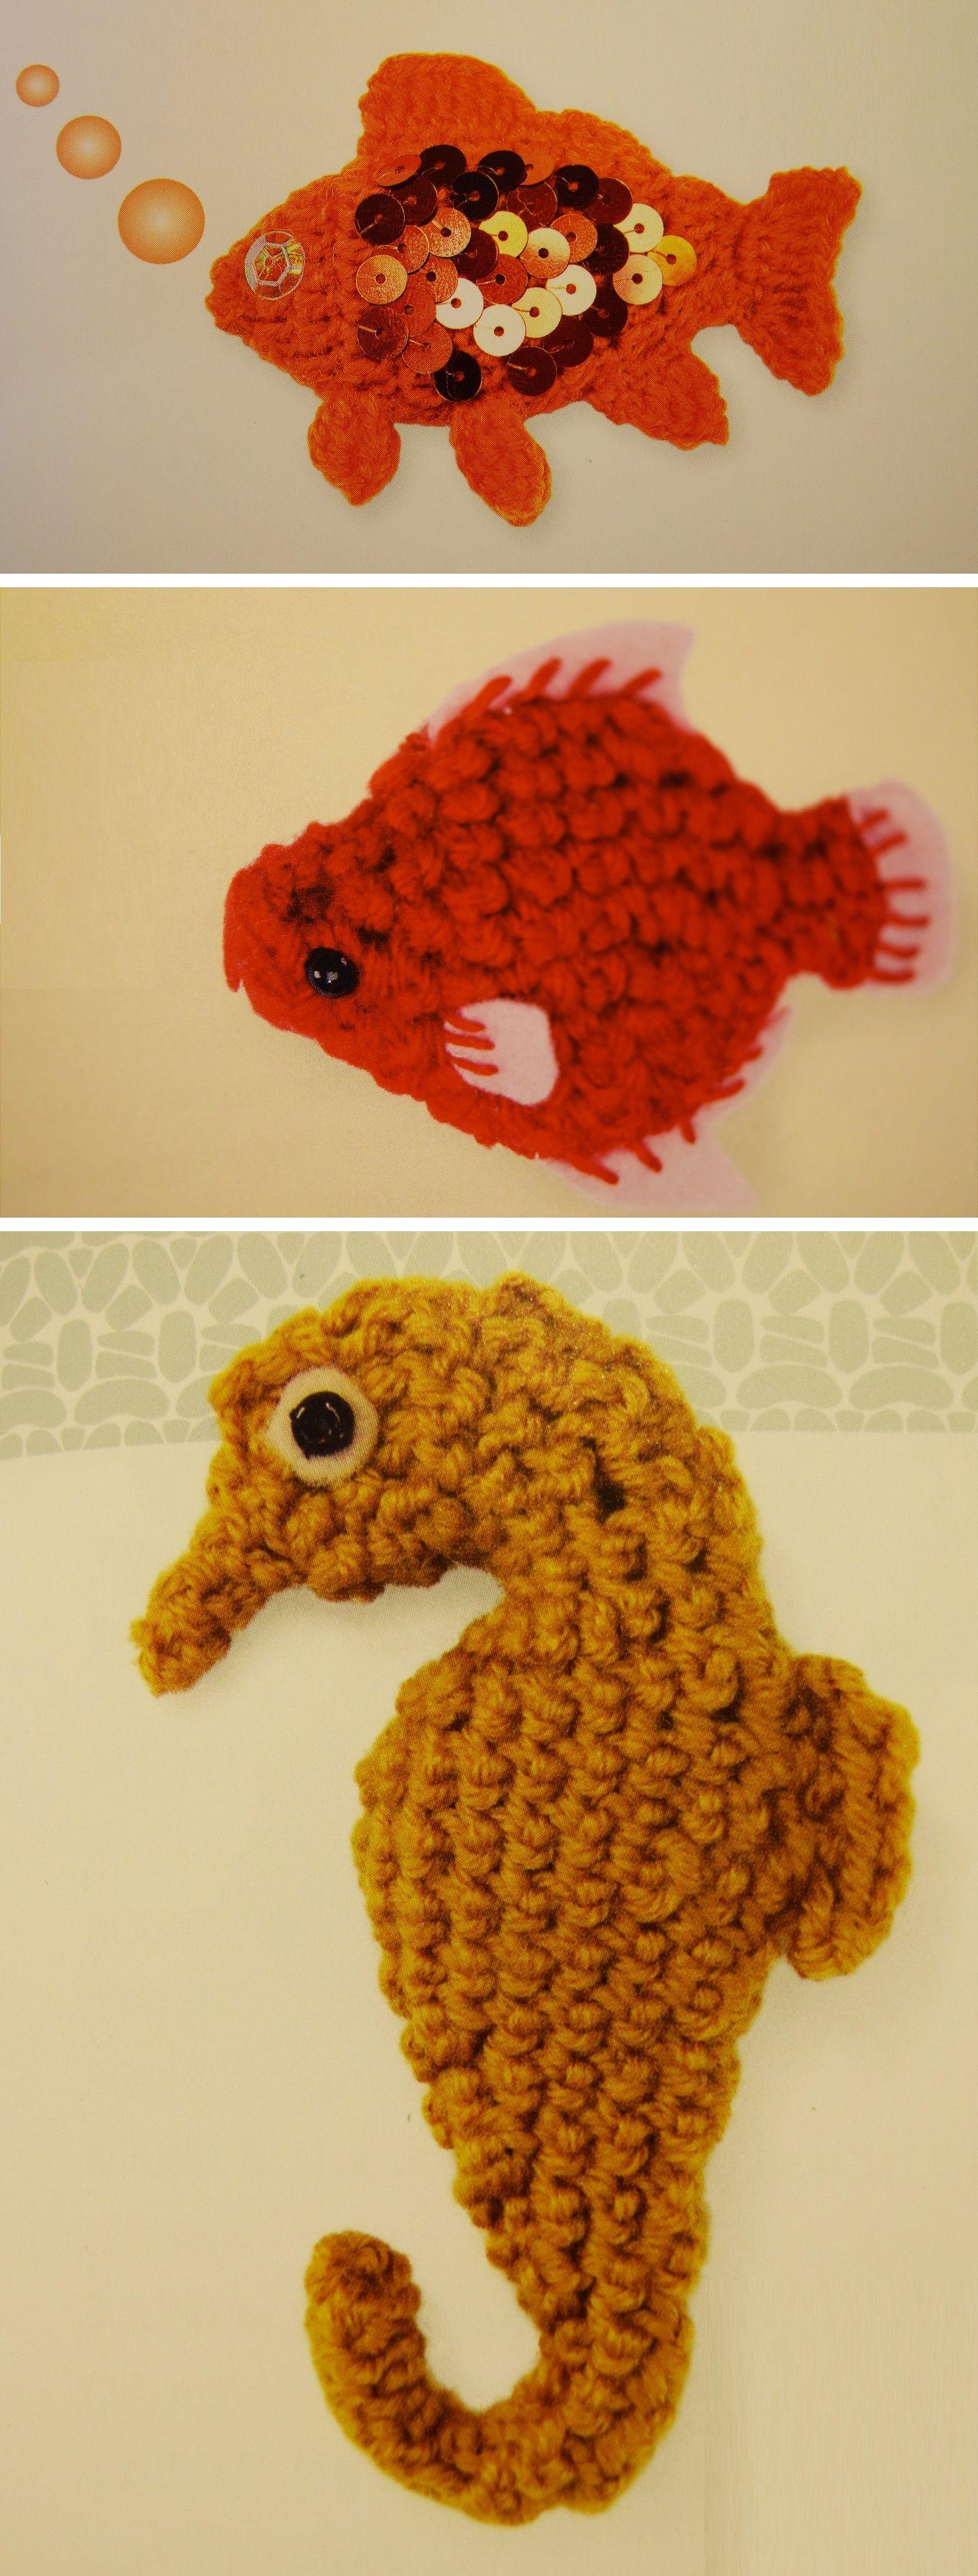 Goldfish, Parrotfish, Seahorse – 3 Crochet Patterns